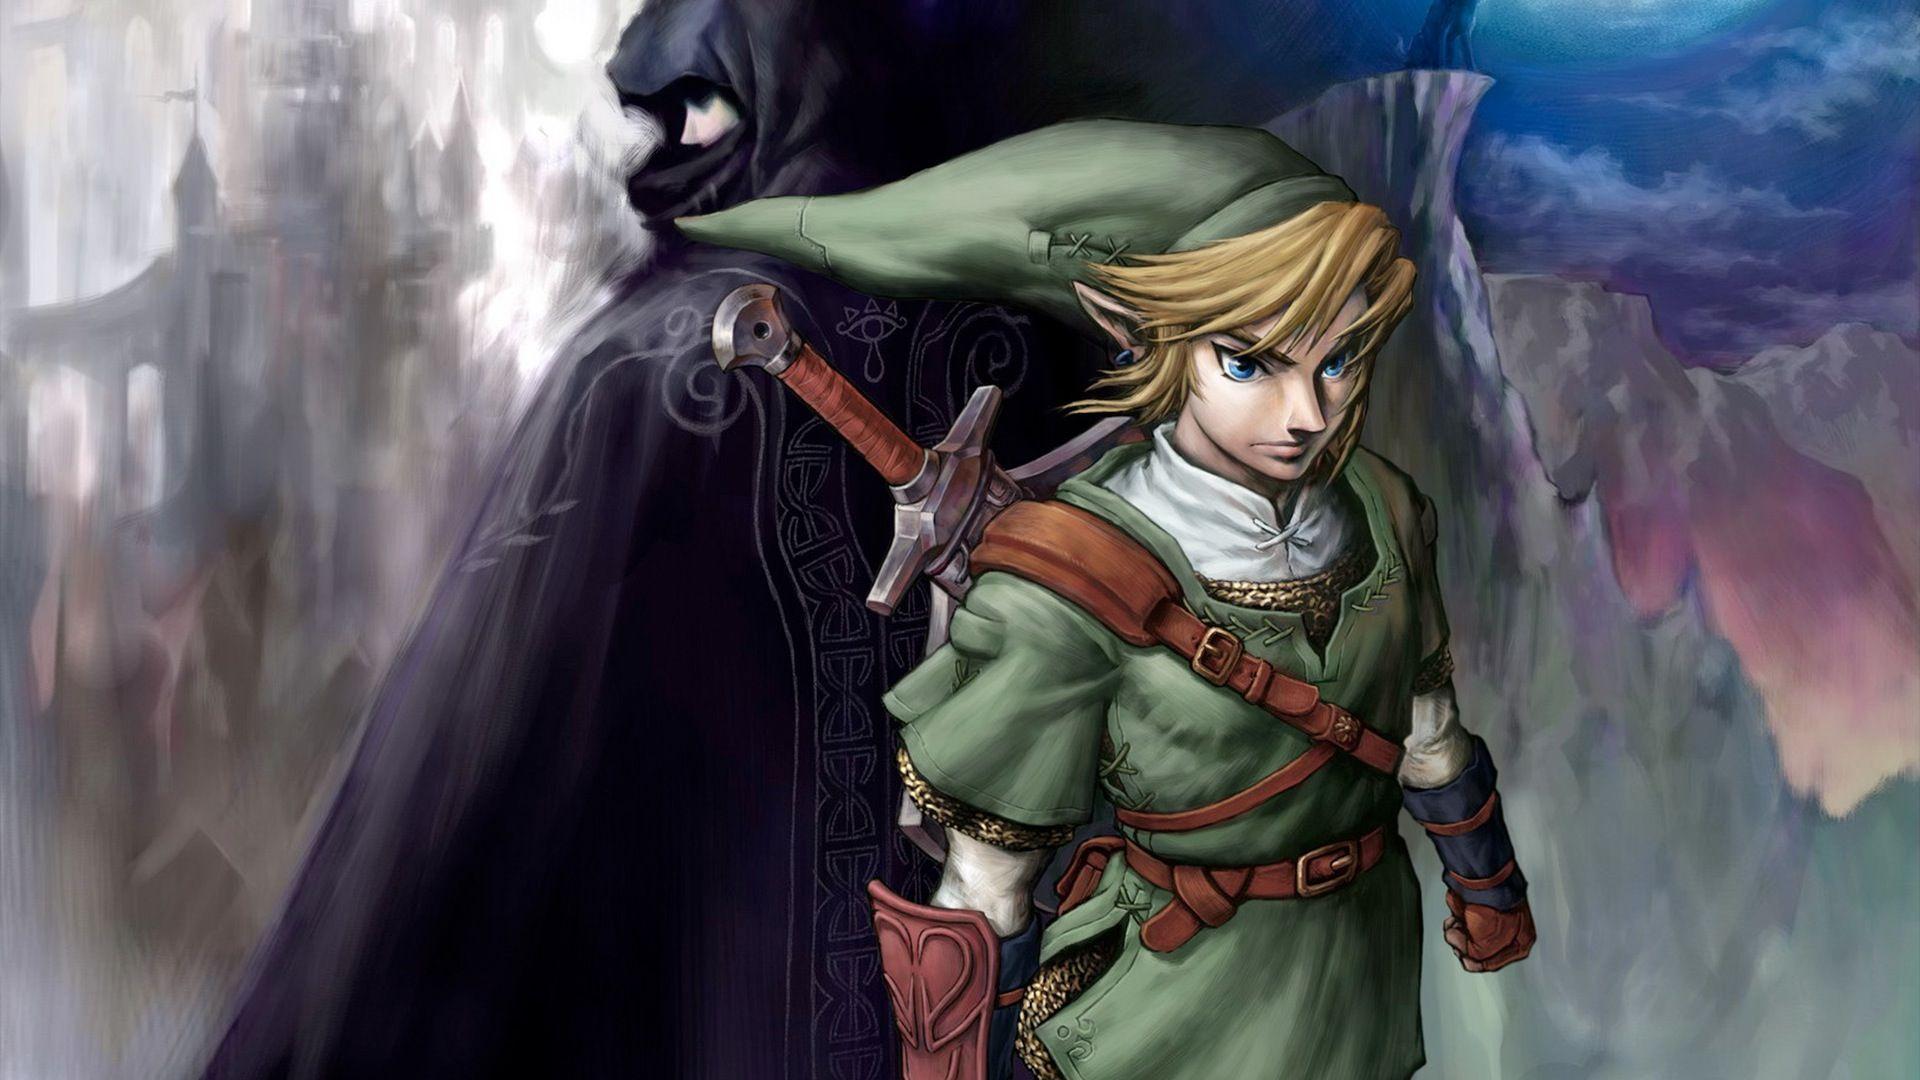 The Legend Of Zelda Hd High Quality Wallpapers Download Legend